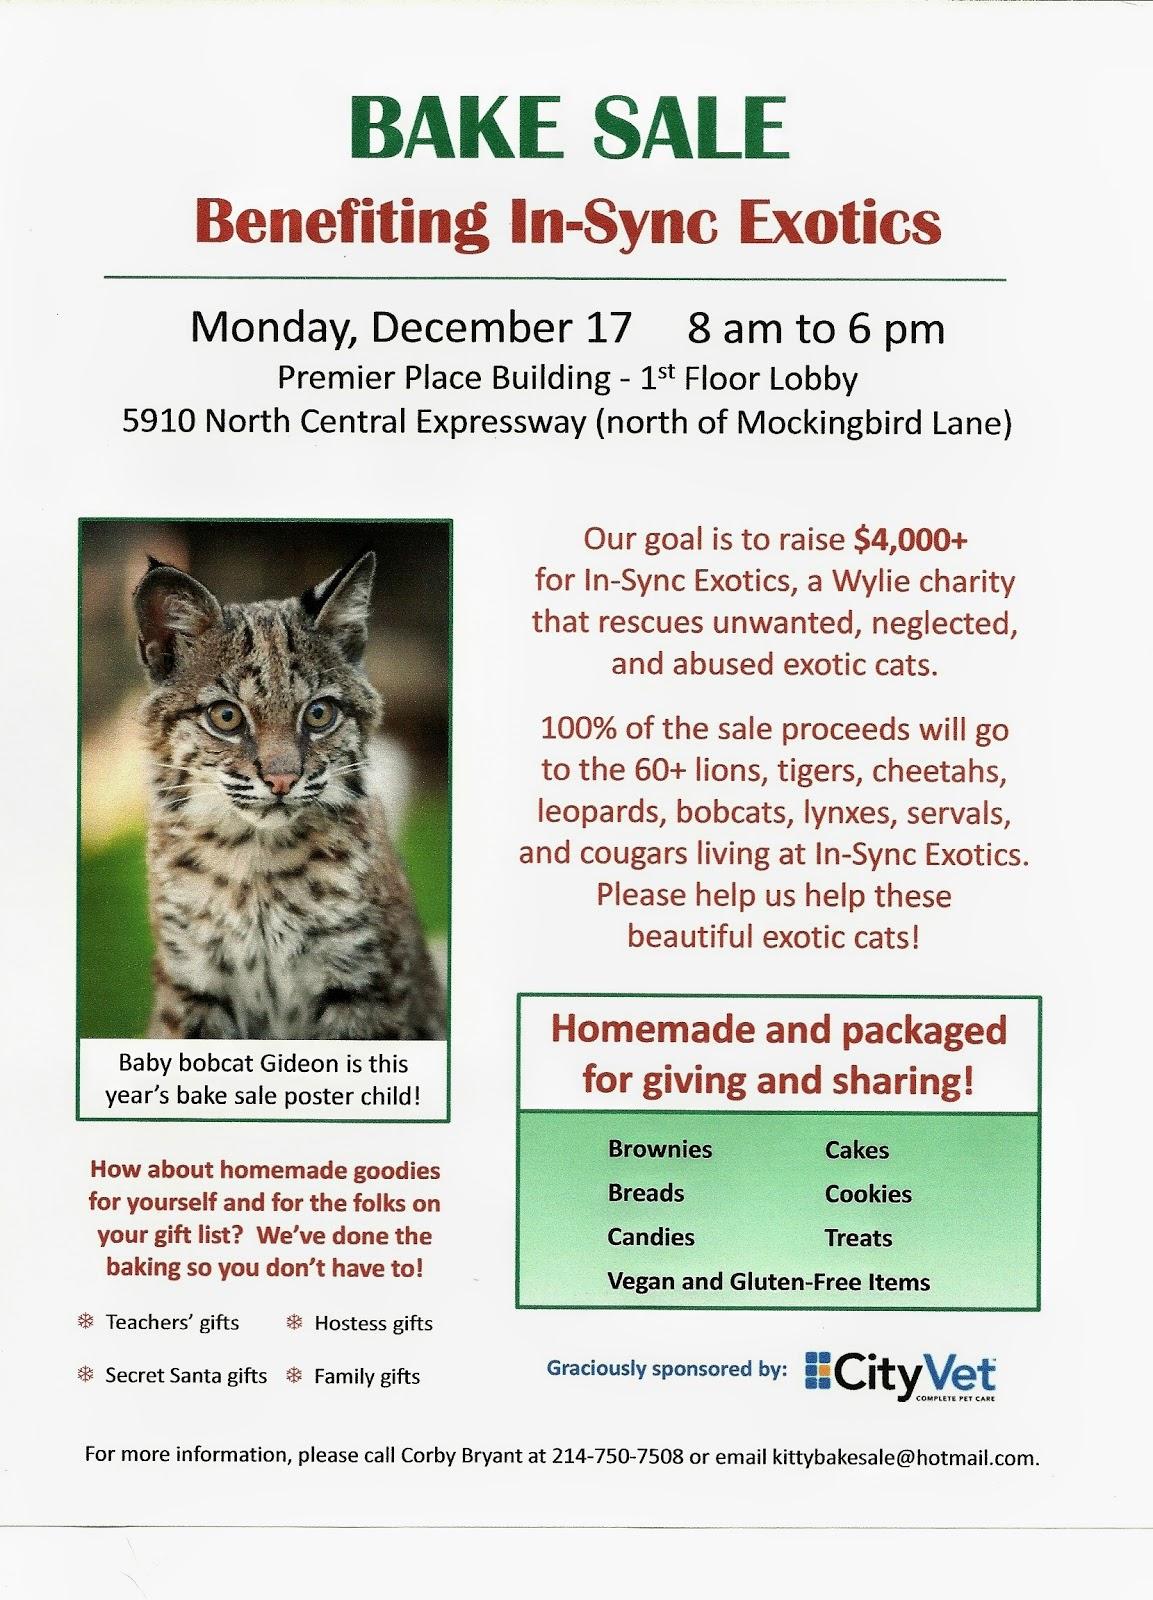 In-Sync Exotics\' Cat Tales: 12/9/12 - 12/16/12